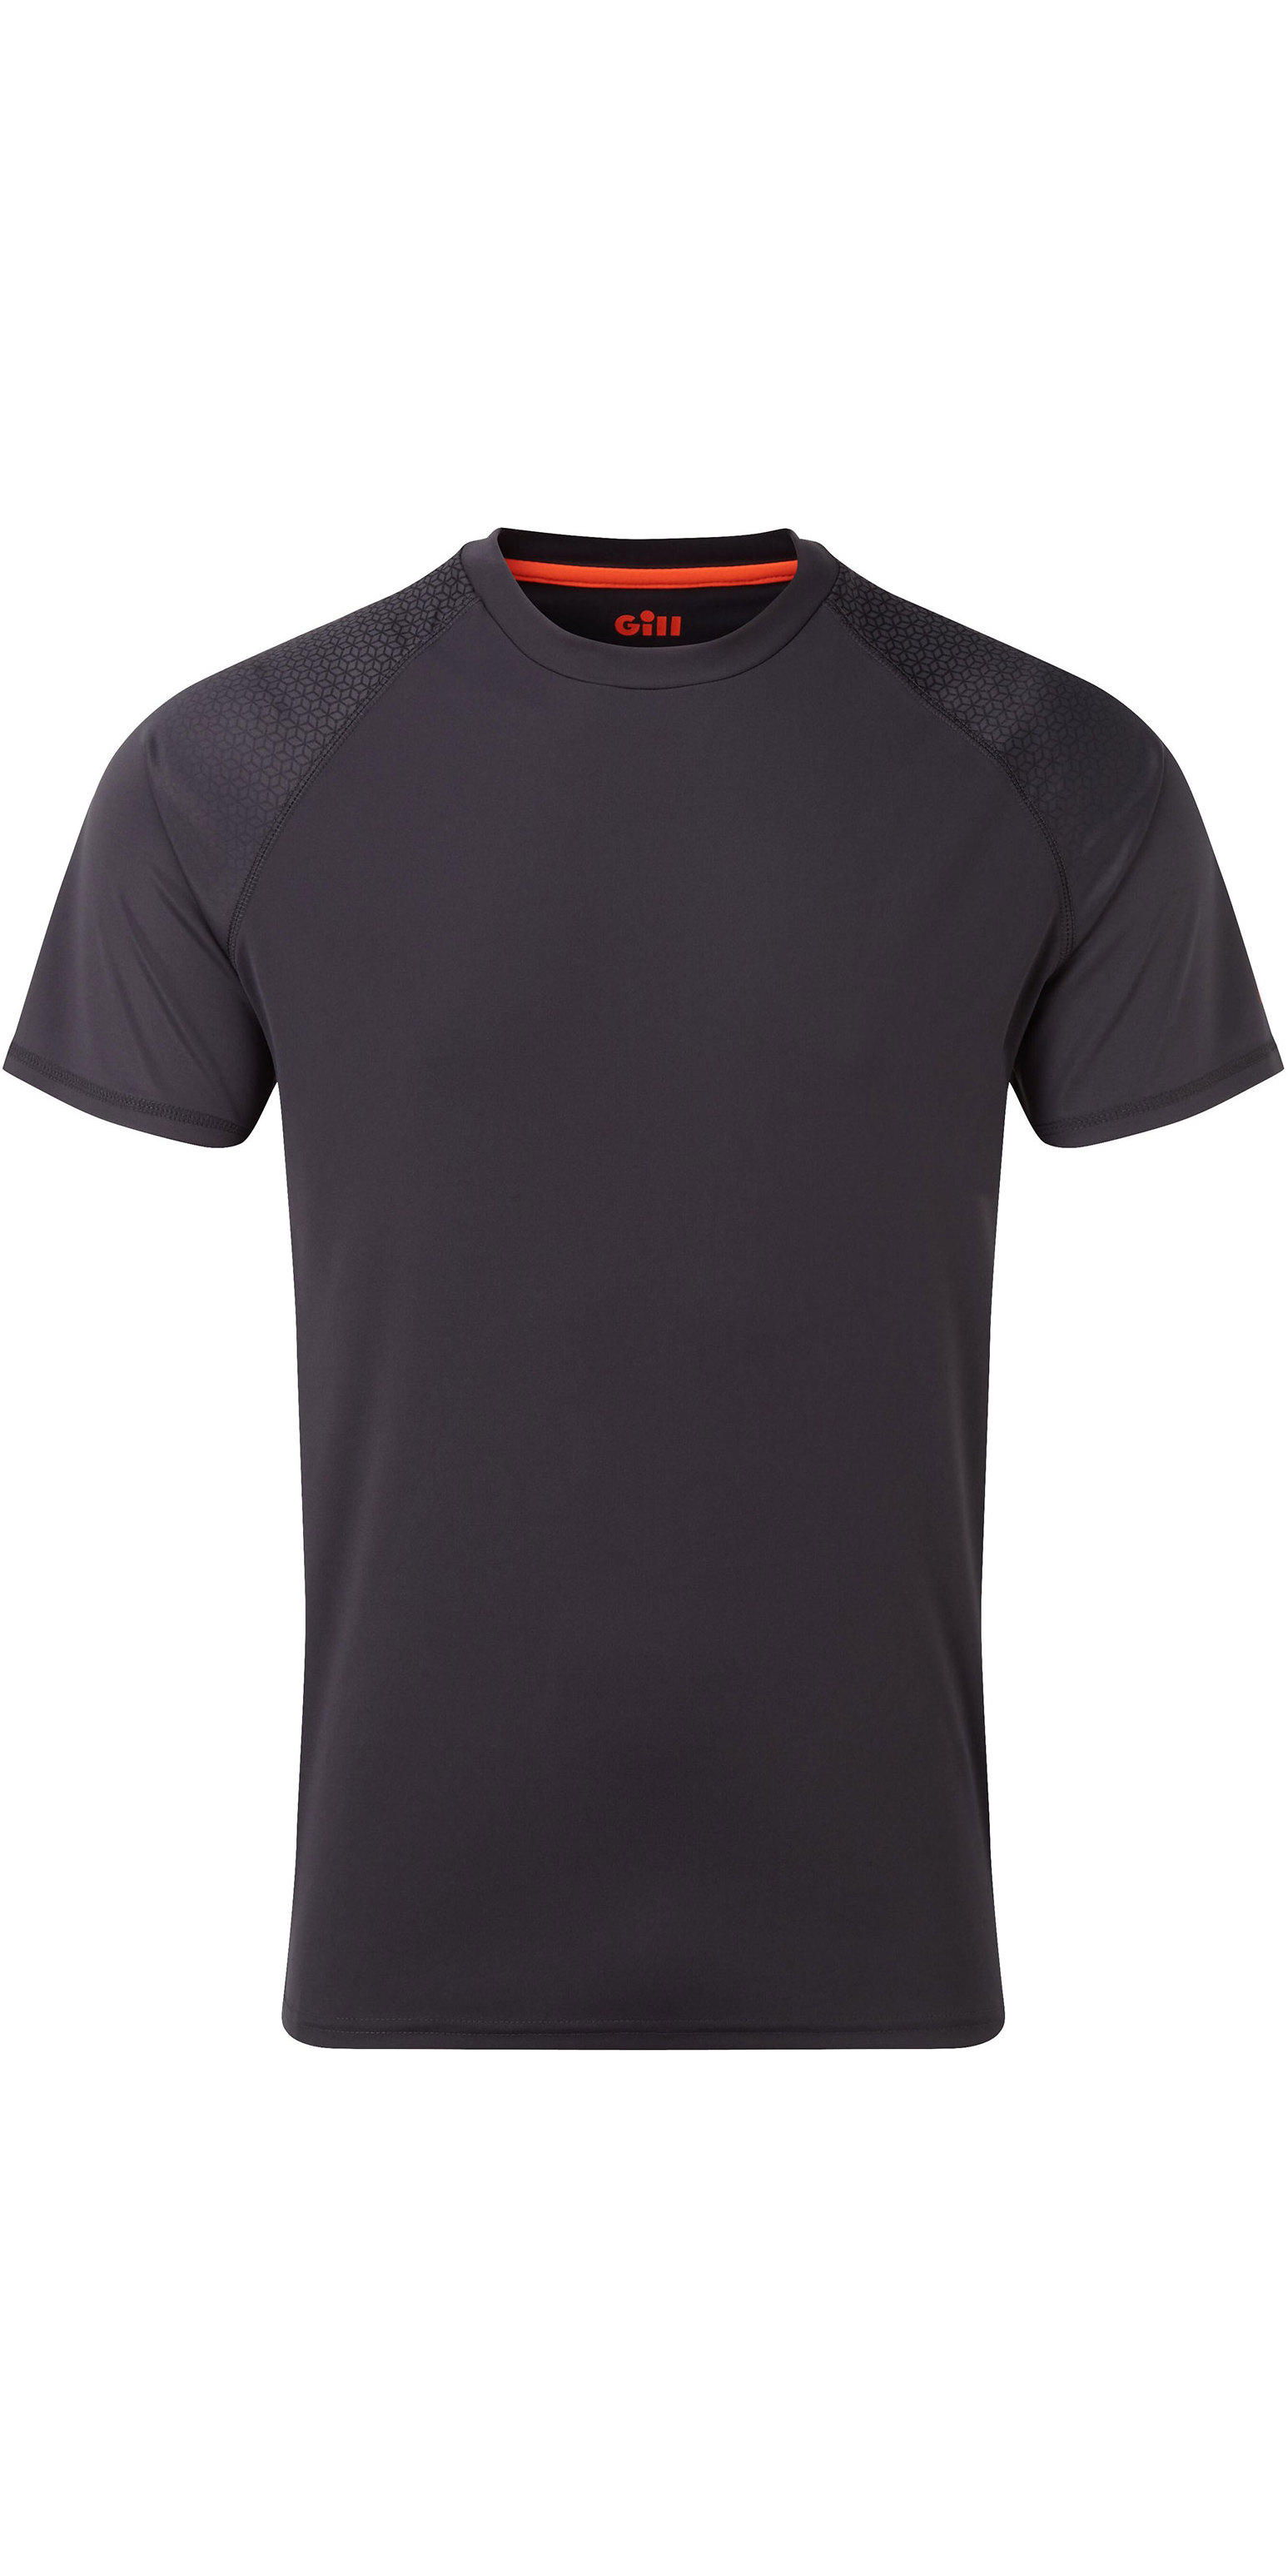 2020 Gill Mens UV Tec Fade Print Tee Charcoal UV015